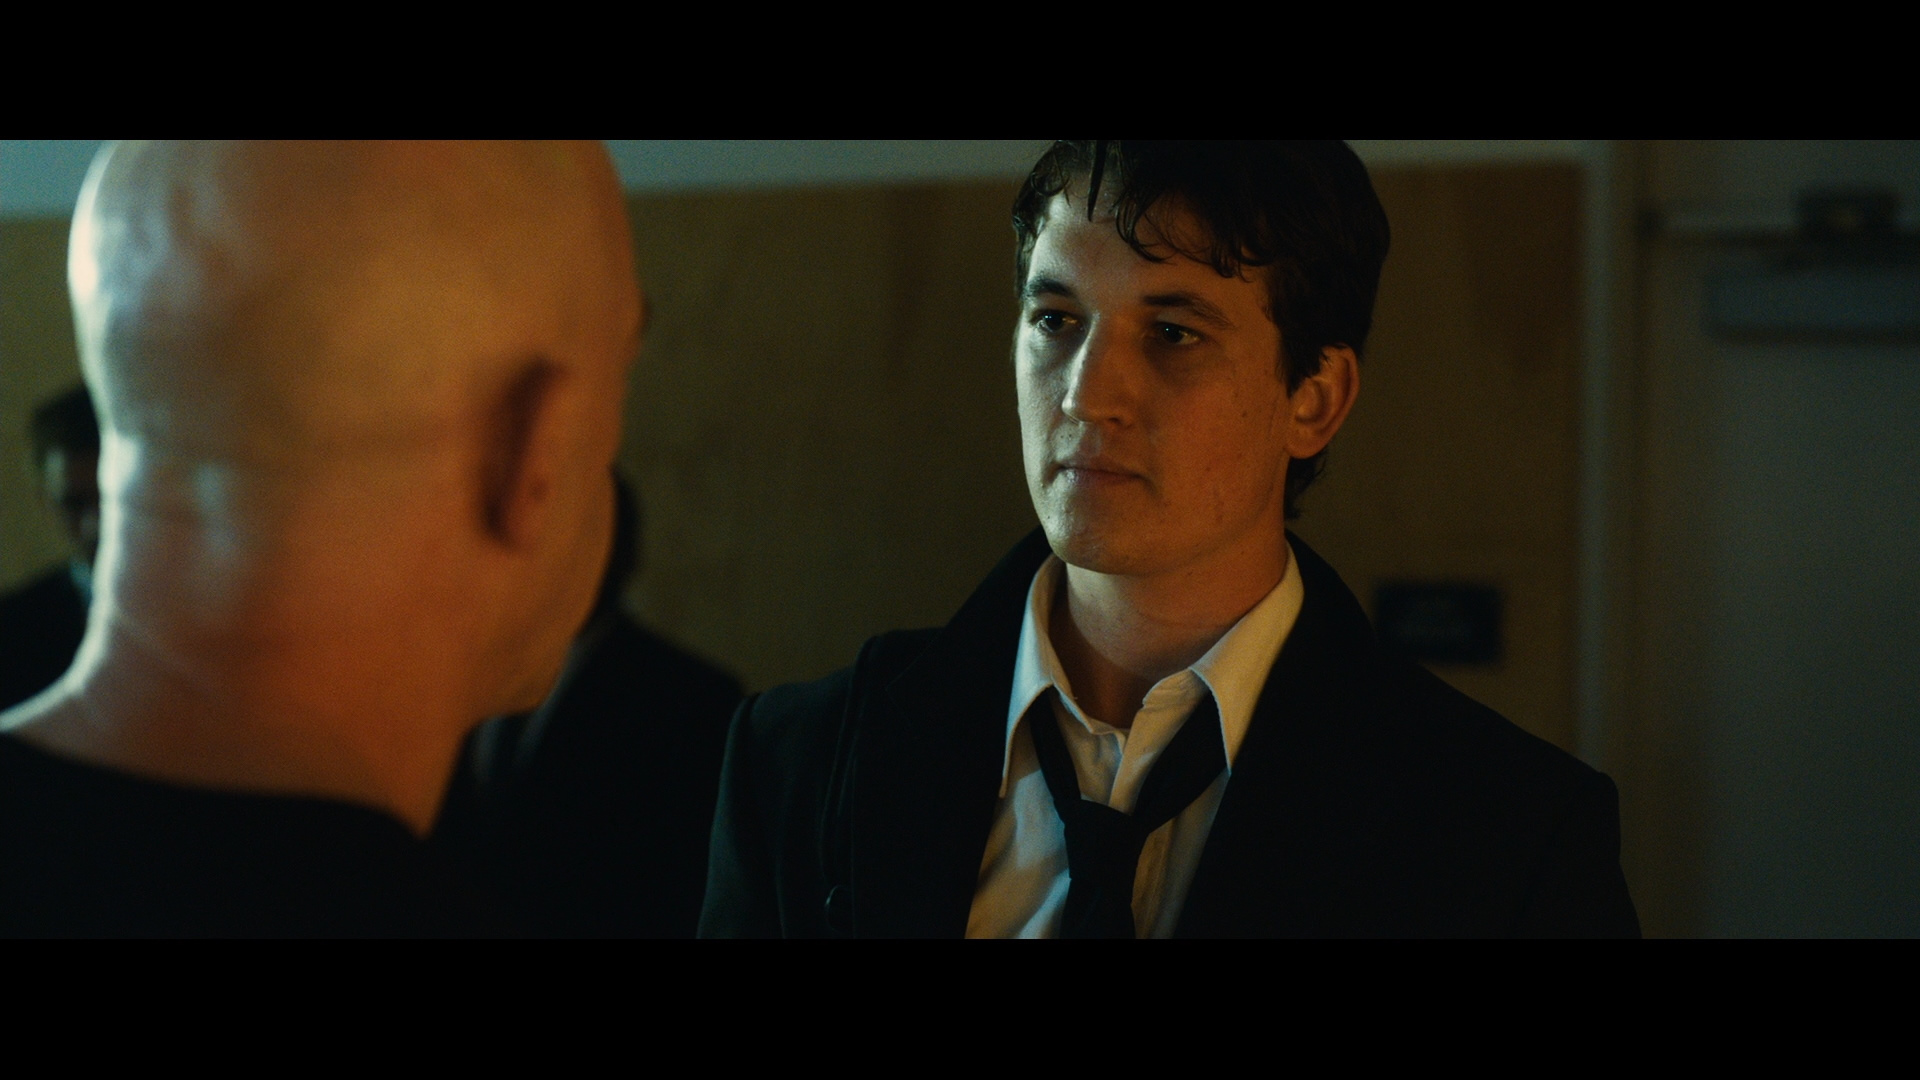 https://i2.wp.com/www.dvdbeaver.com/film5/blu-ray_reviews_66/whiplash_blu-ray_/large/large_whiplash_11_blu-ray_.jpg